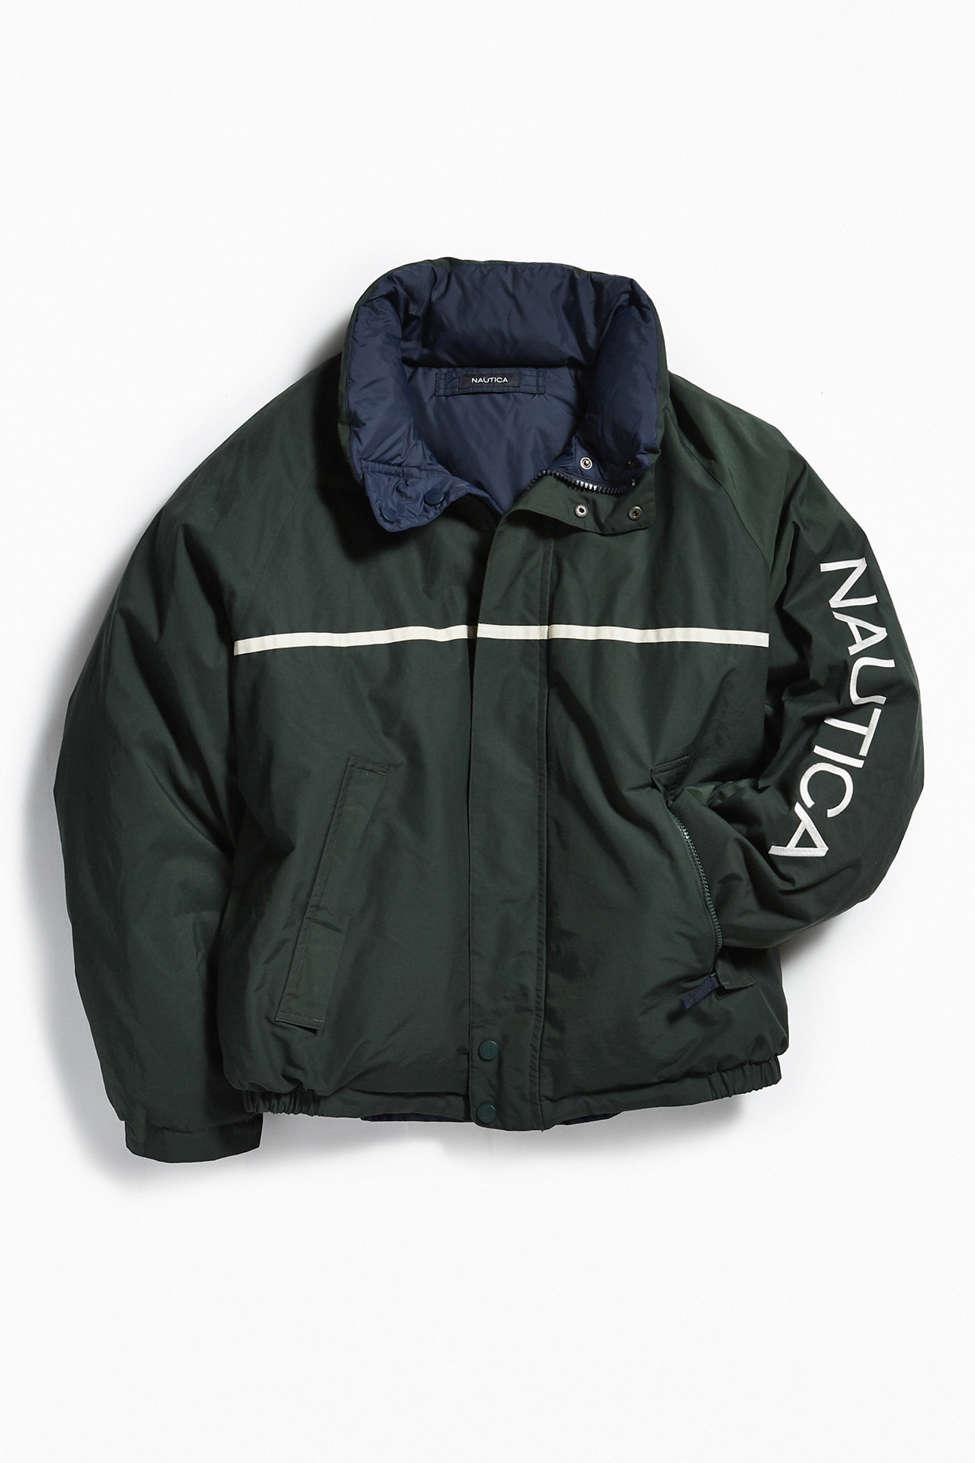 Vintage Nautica Dark Green Reversible Puffer Jacket Urban